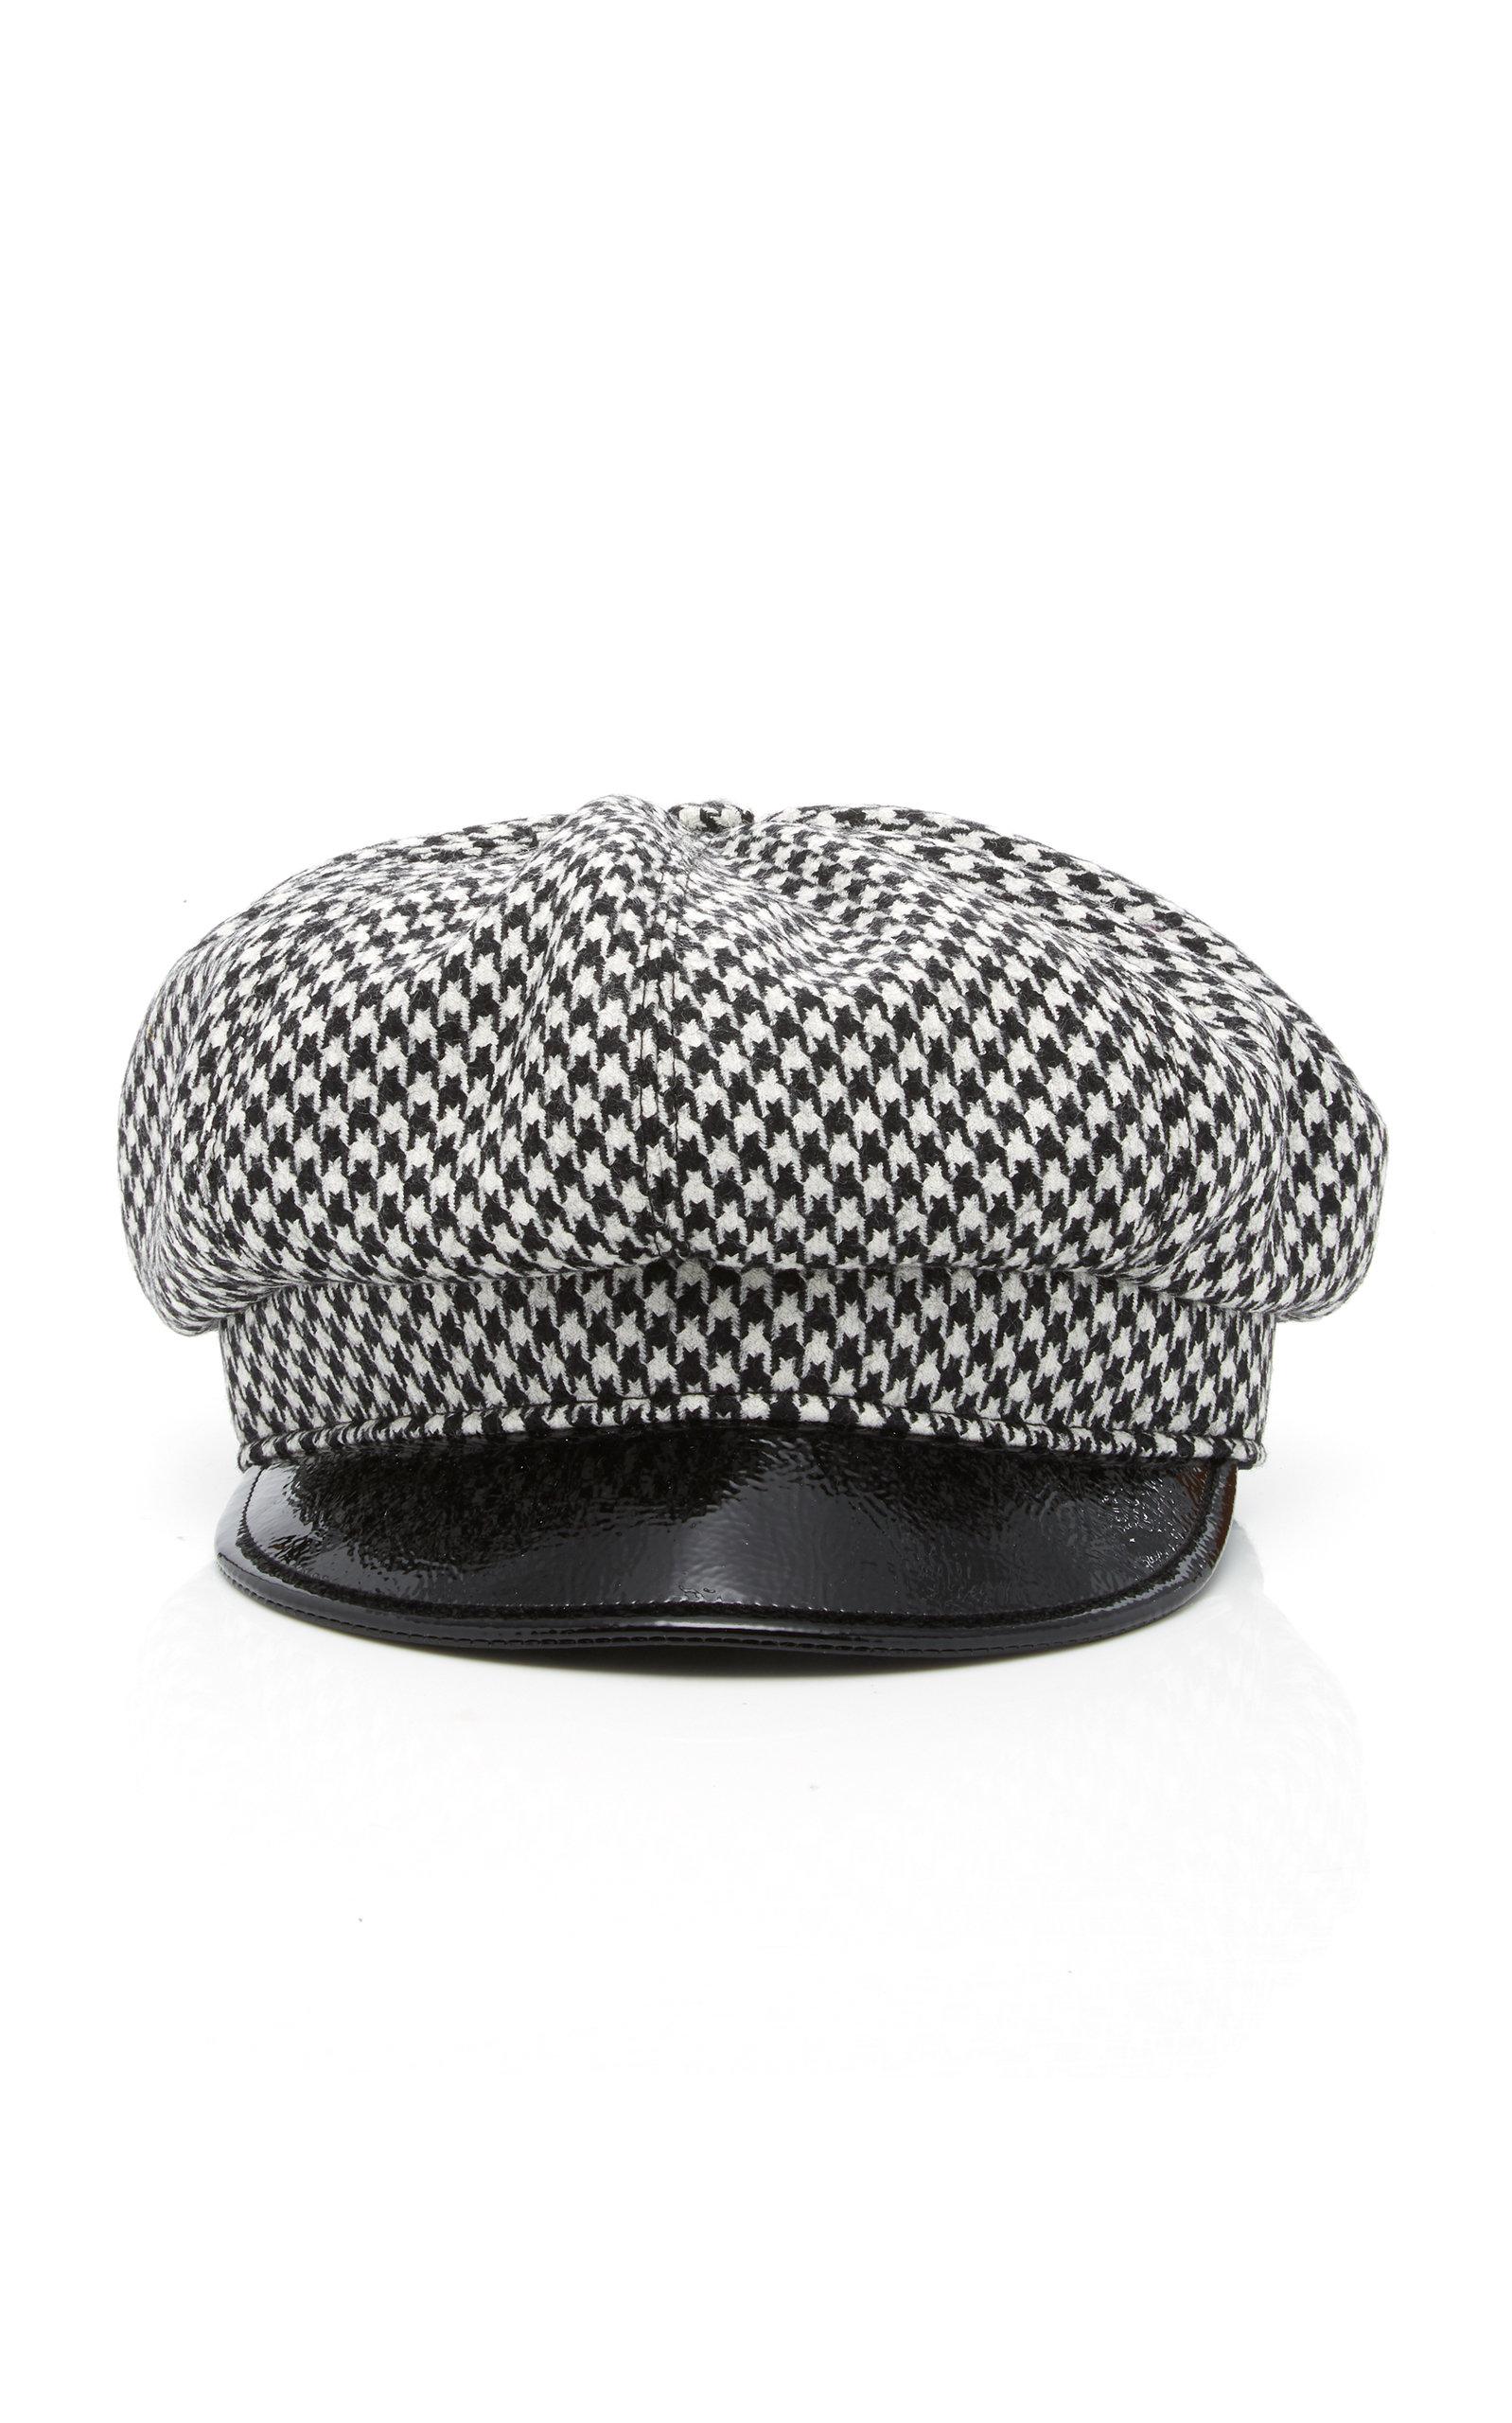 Carnaby Packable Baker Boy Cap - Black in Black/White